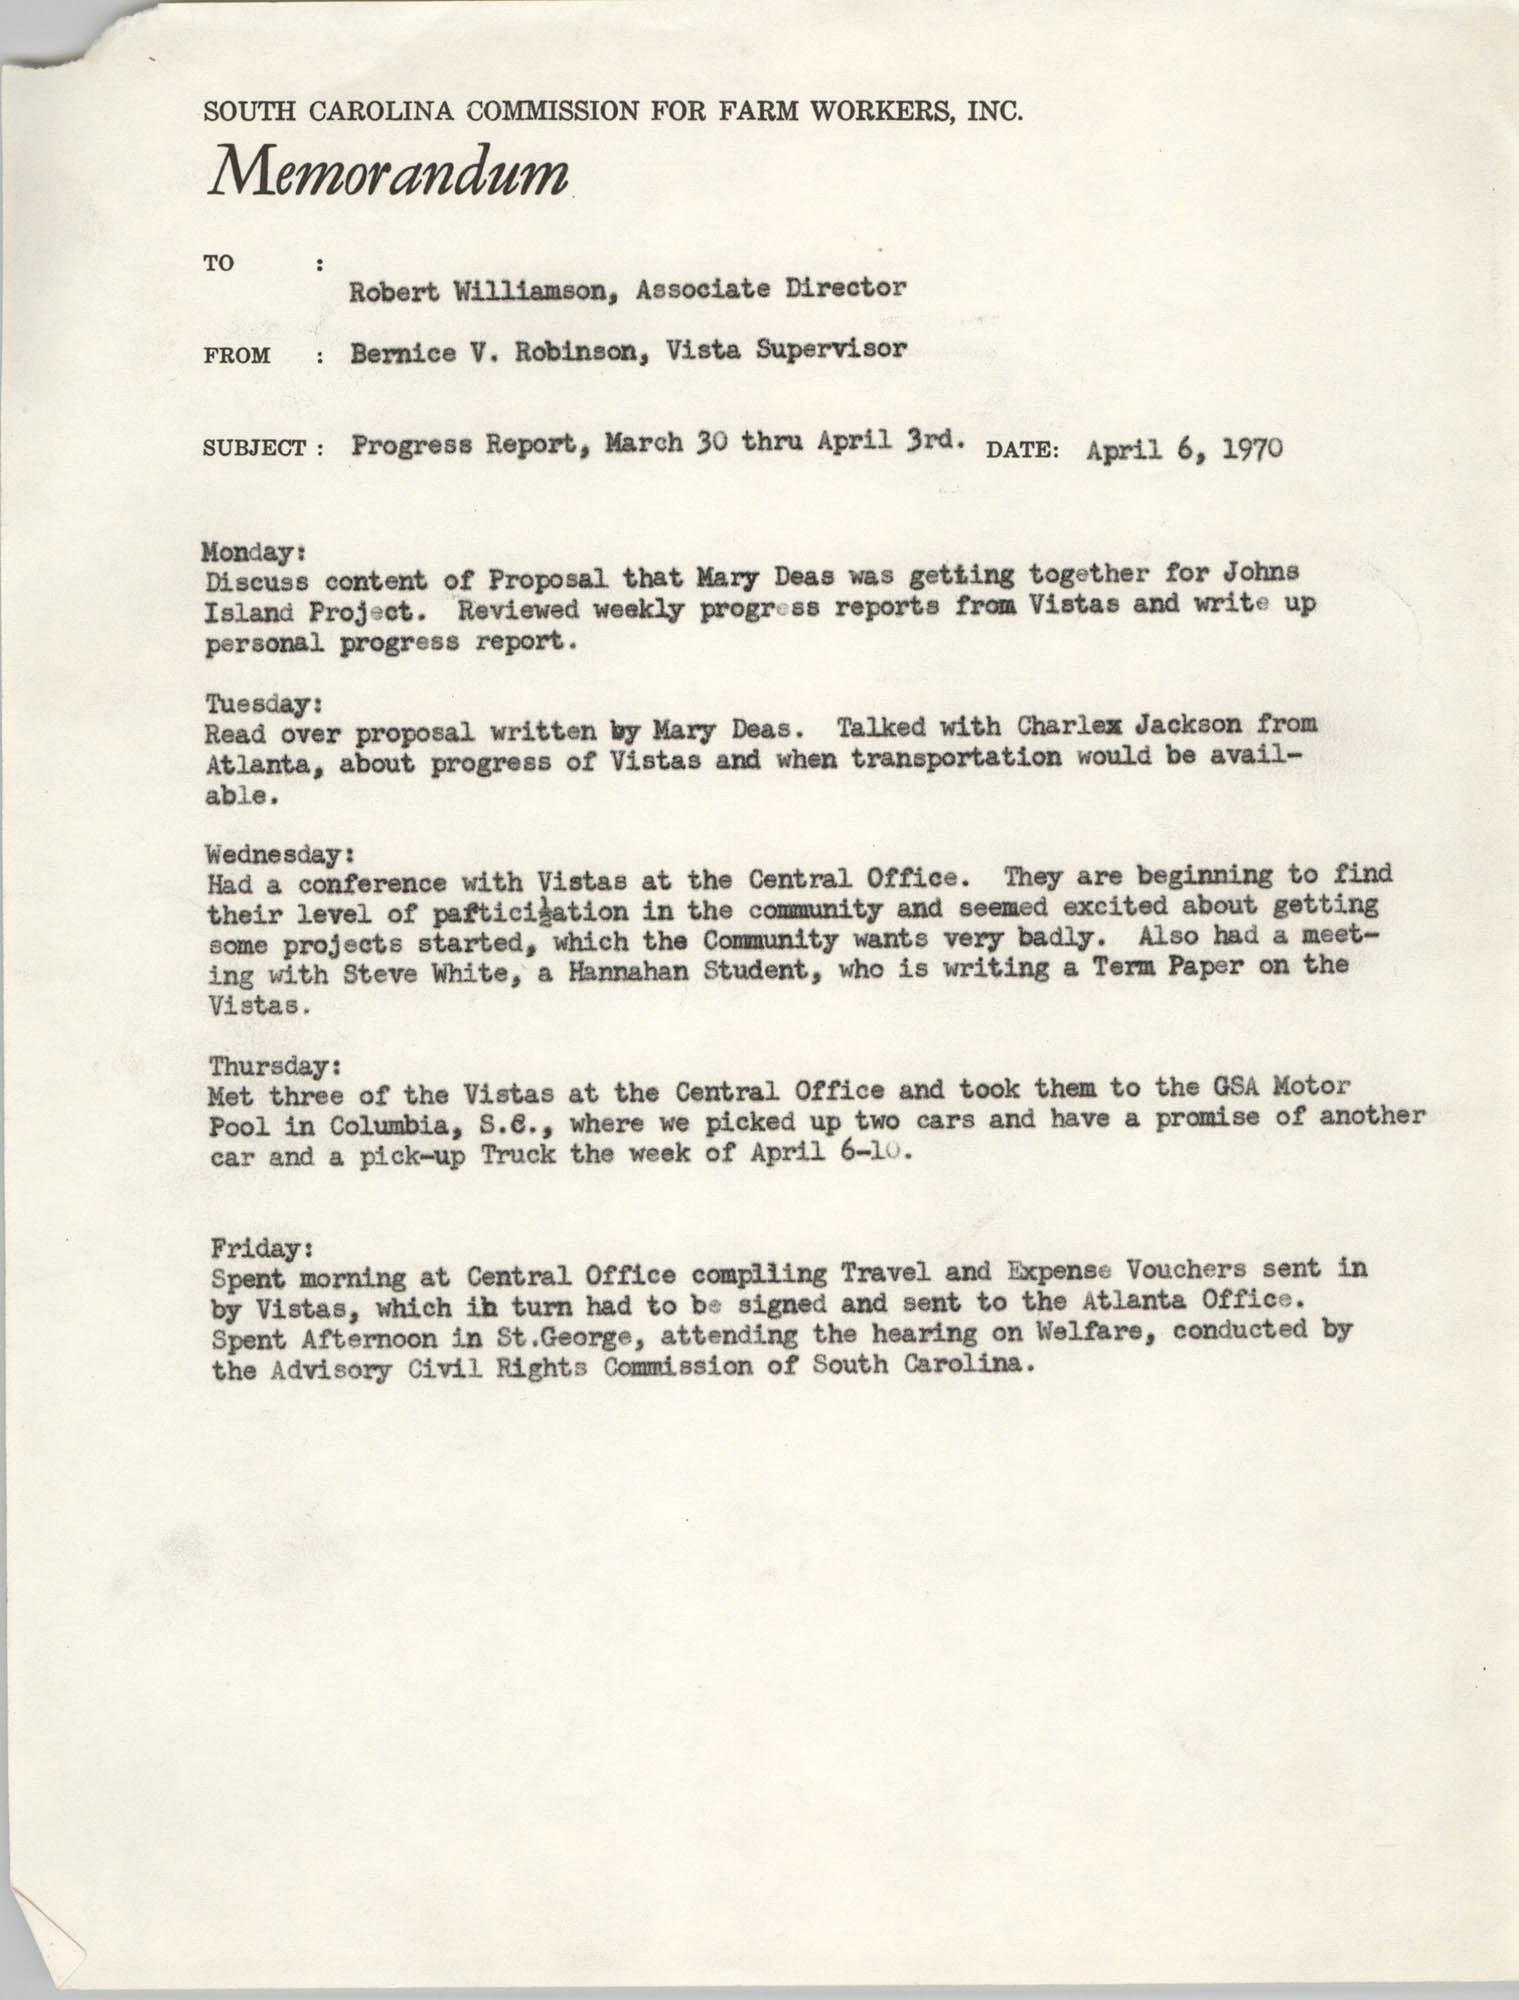 Memorandum from Bernice V. Robinson to Robert Williamson, April 6, 1970